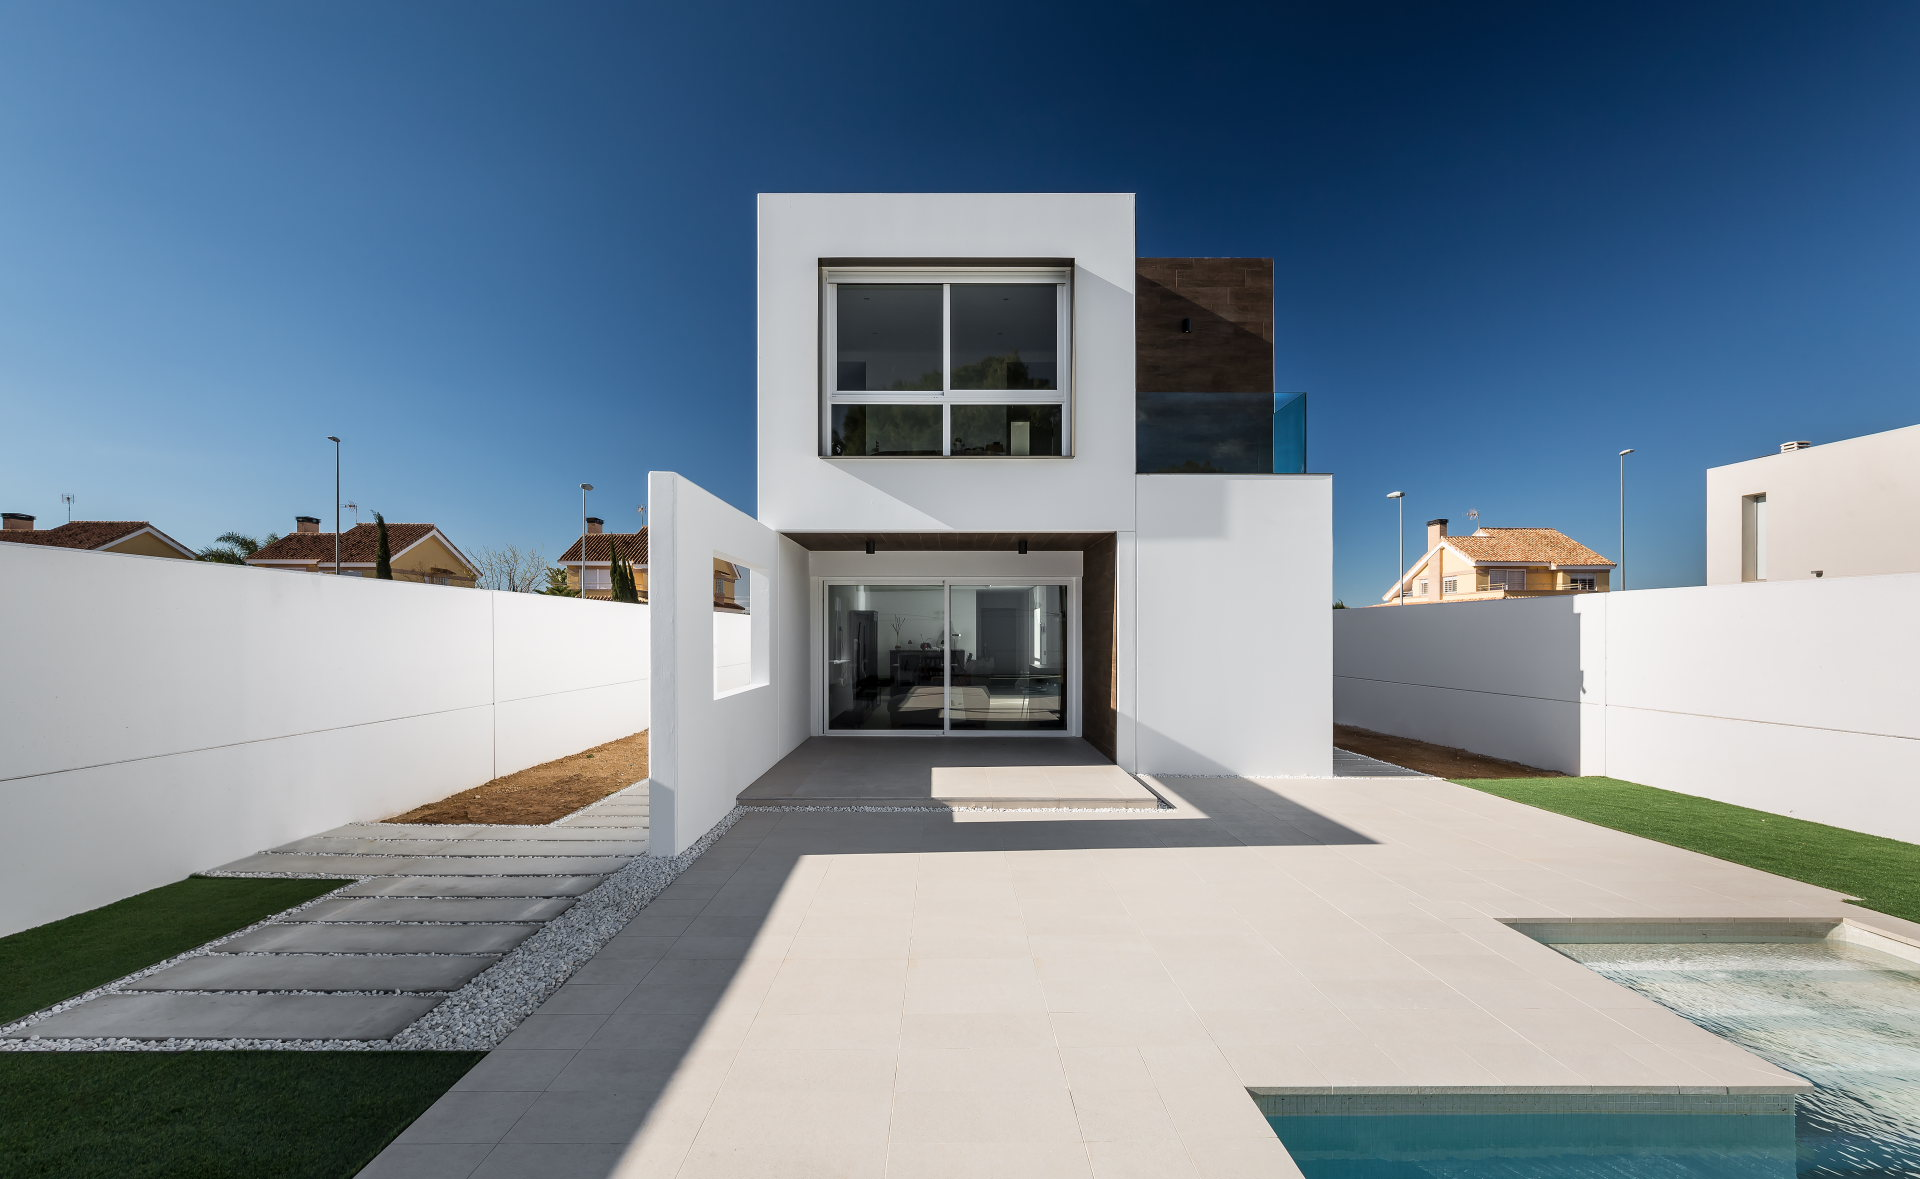 fotografia-arquitectura-valencia-german-cabo-viraje-san-antonio (6)